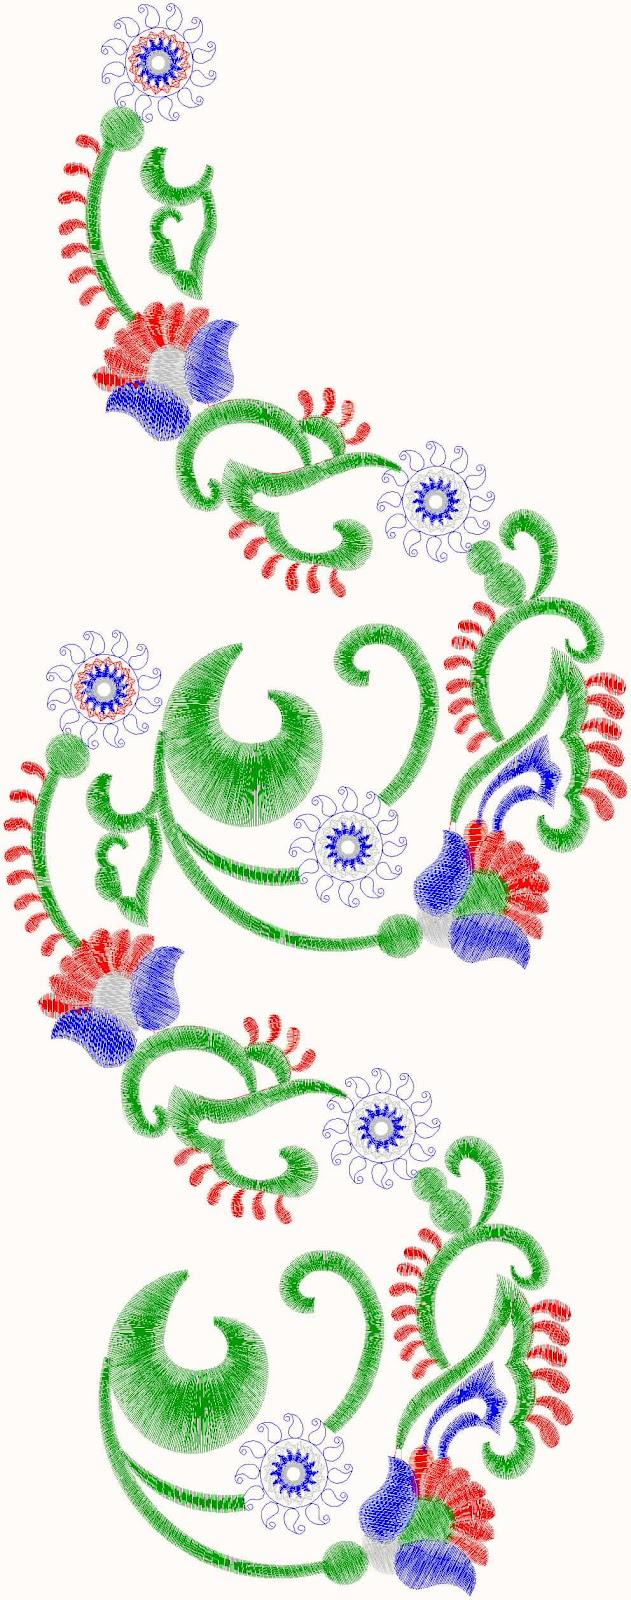 Perfect embroidery designs name makaroka